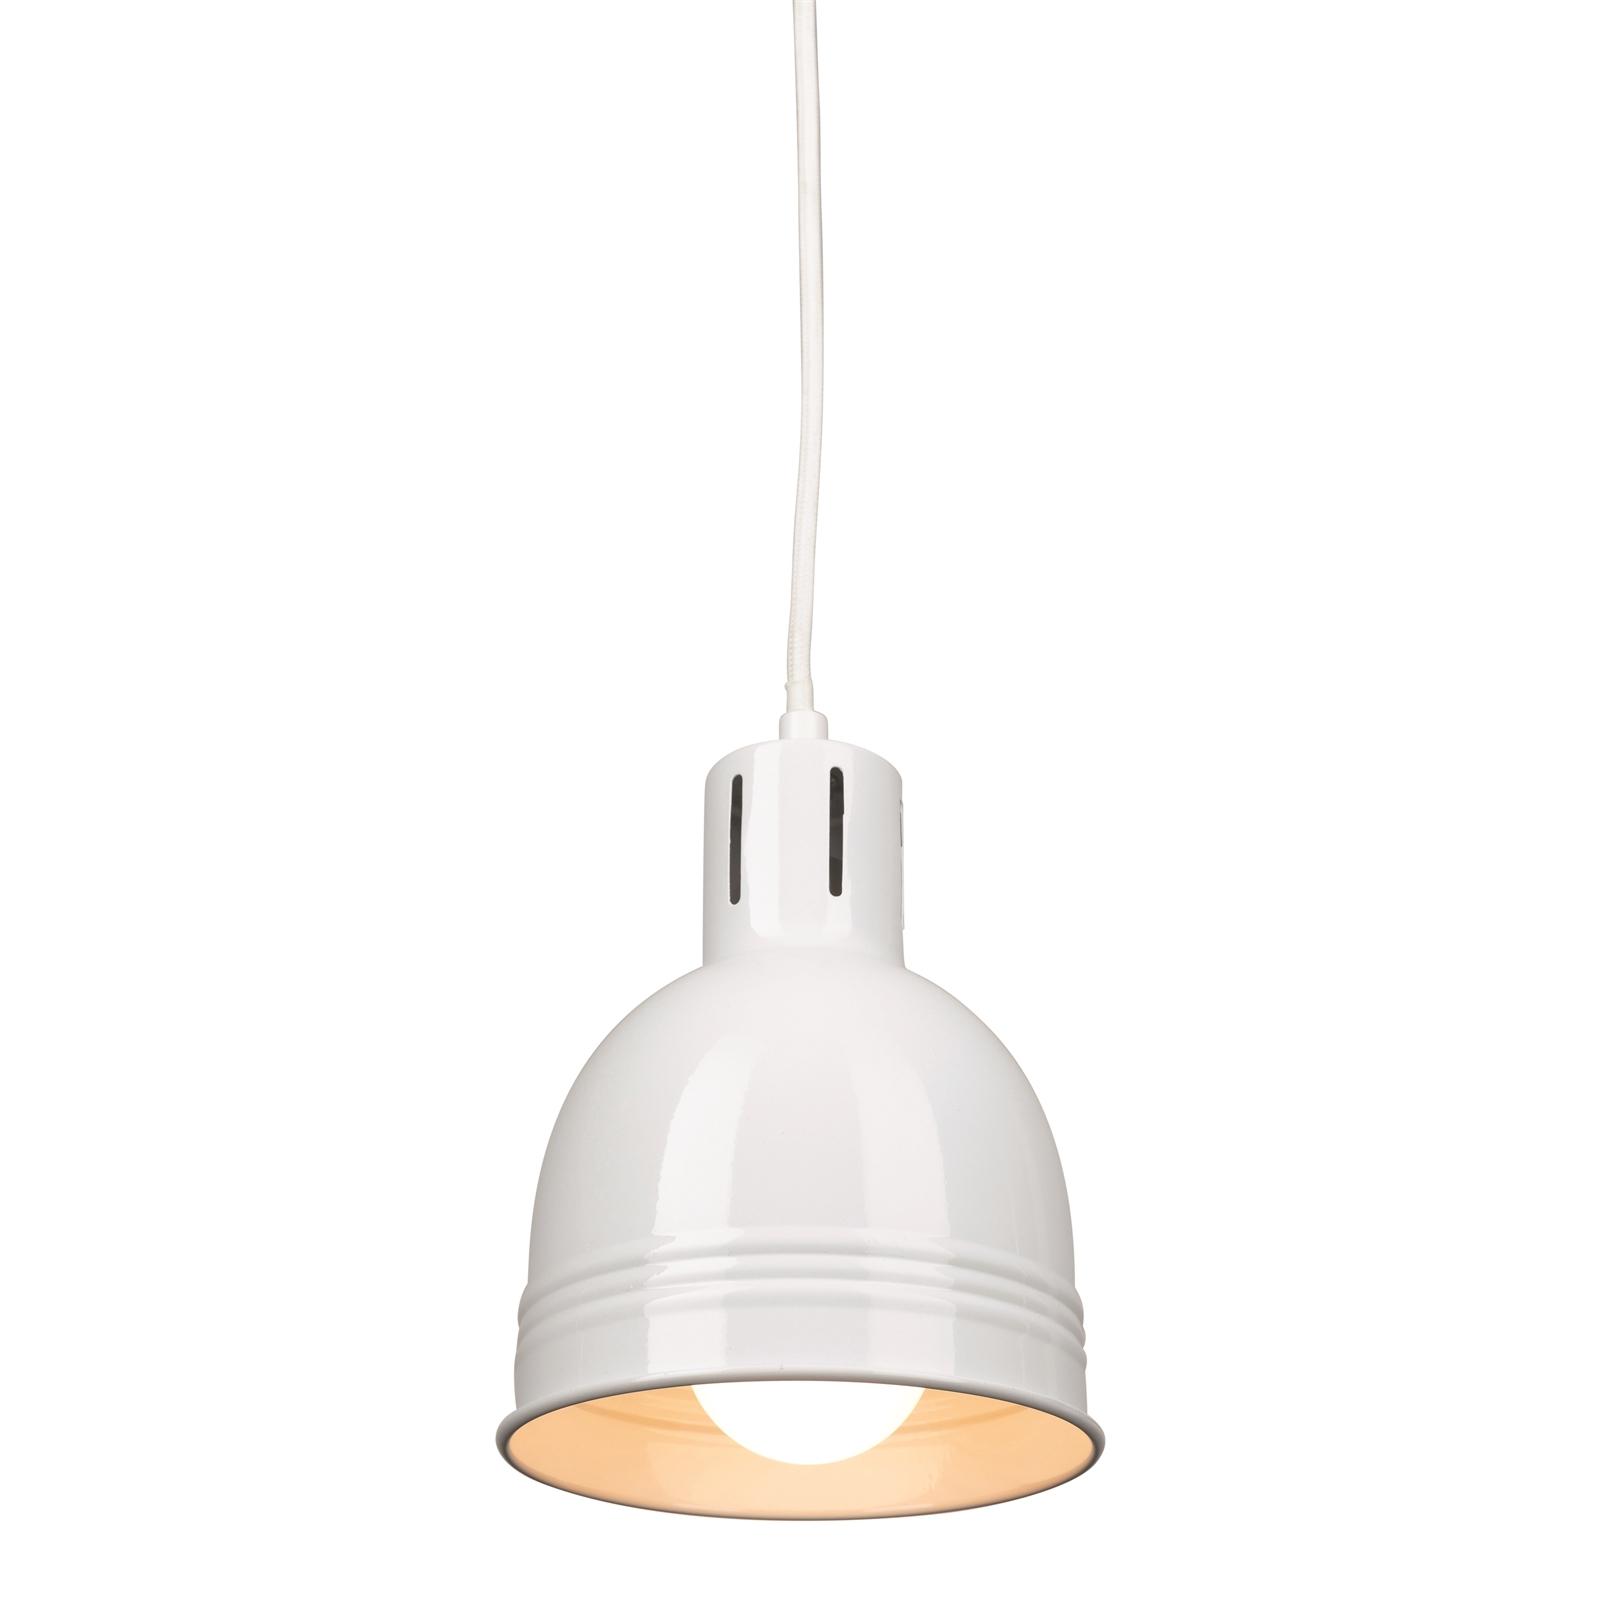 Brilliant Gloss White Milly DIY Suspension Light